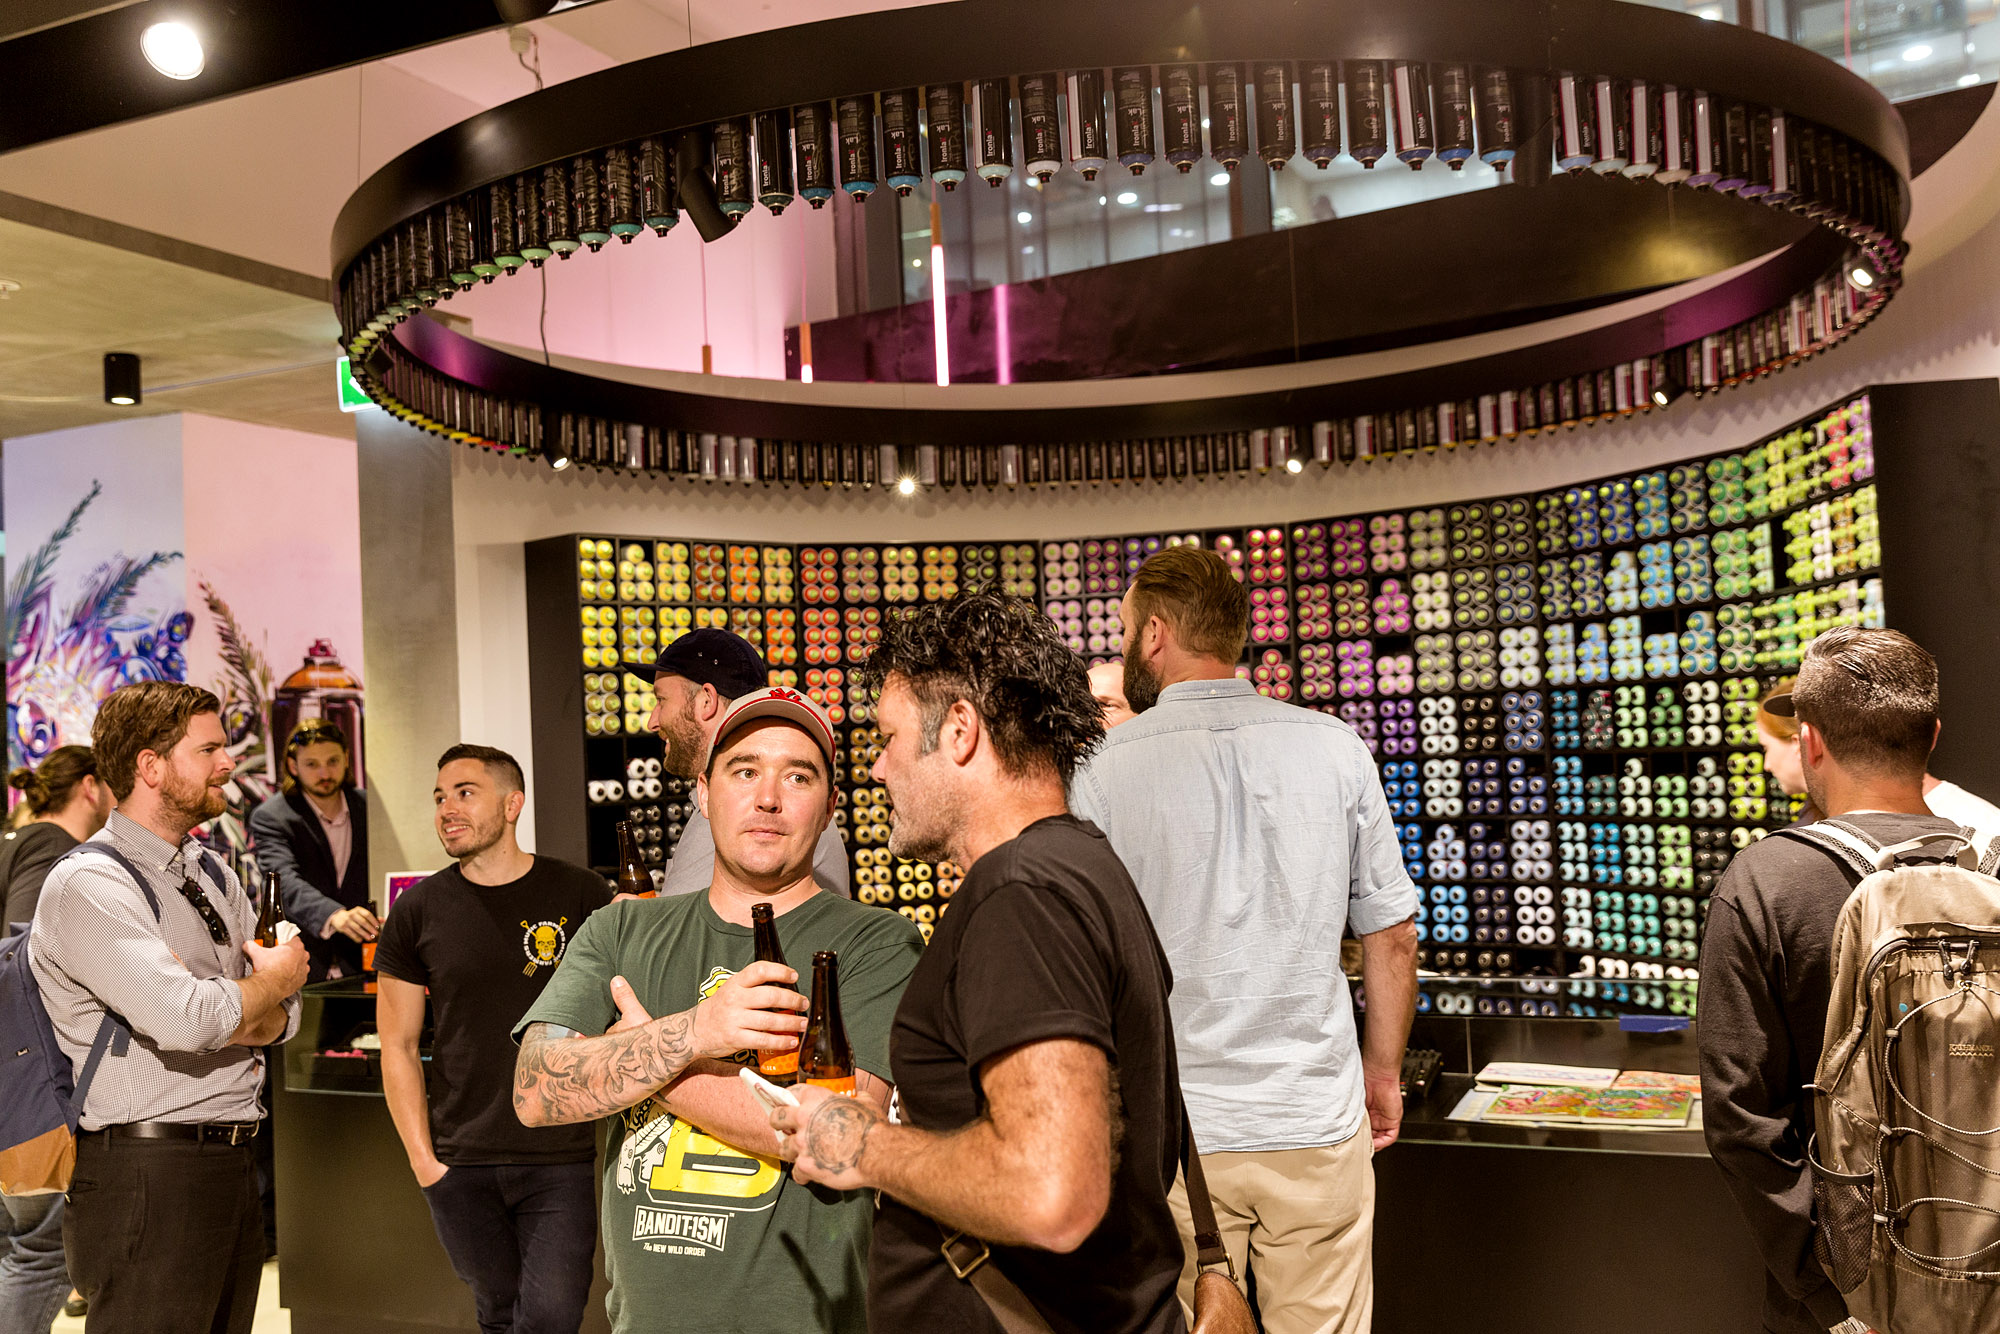 A work by Does - Opening night ironlak shop sydney 8